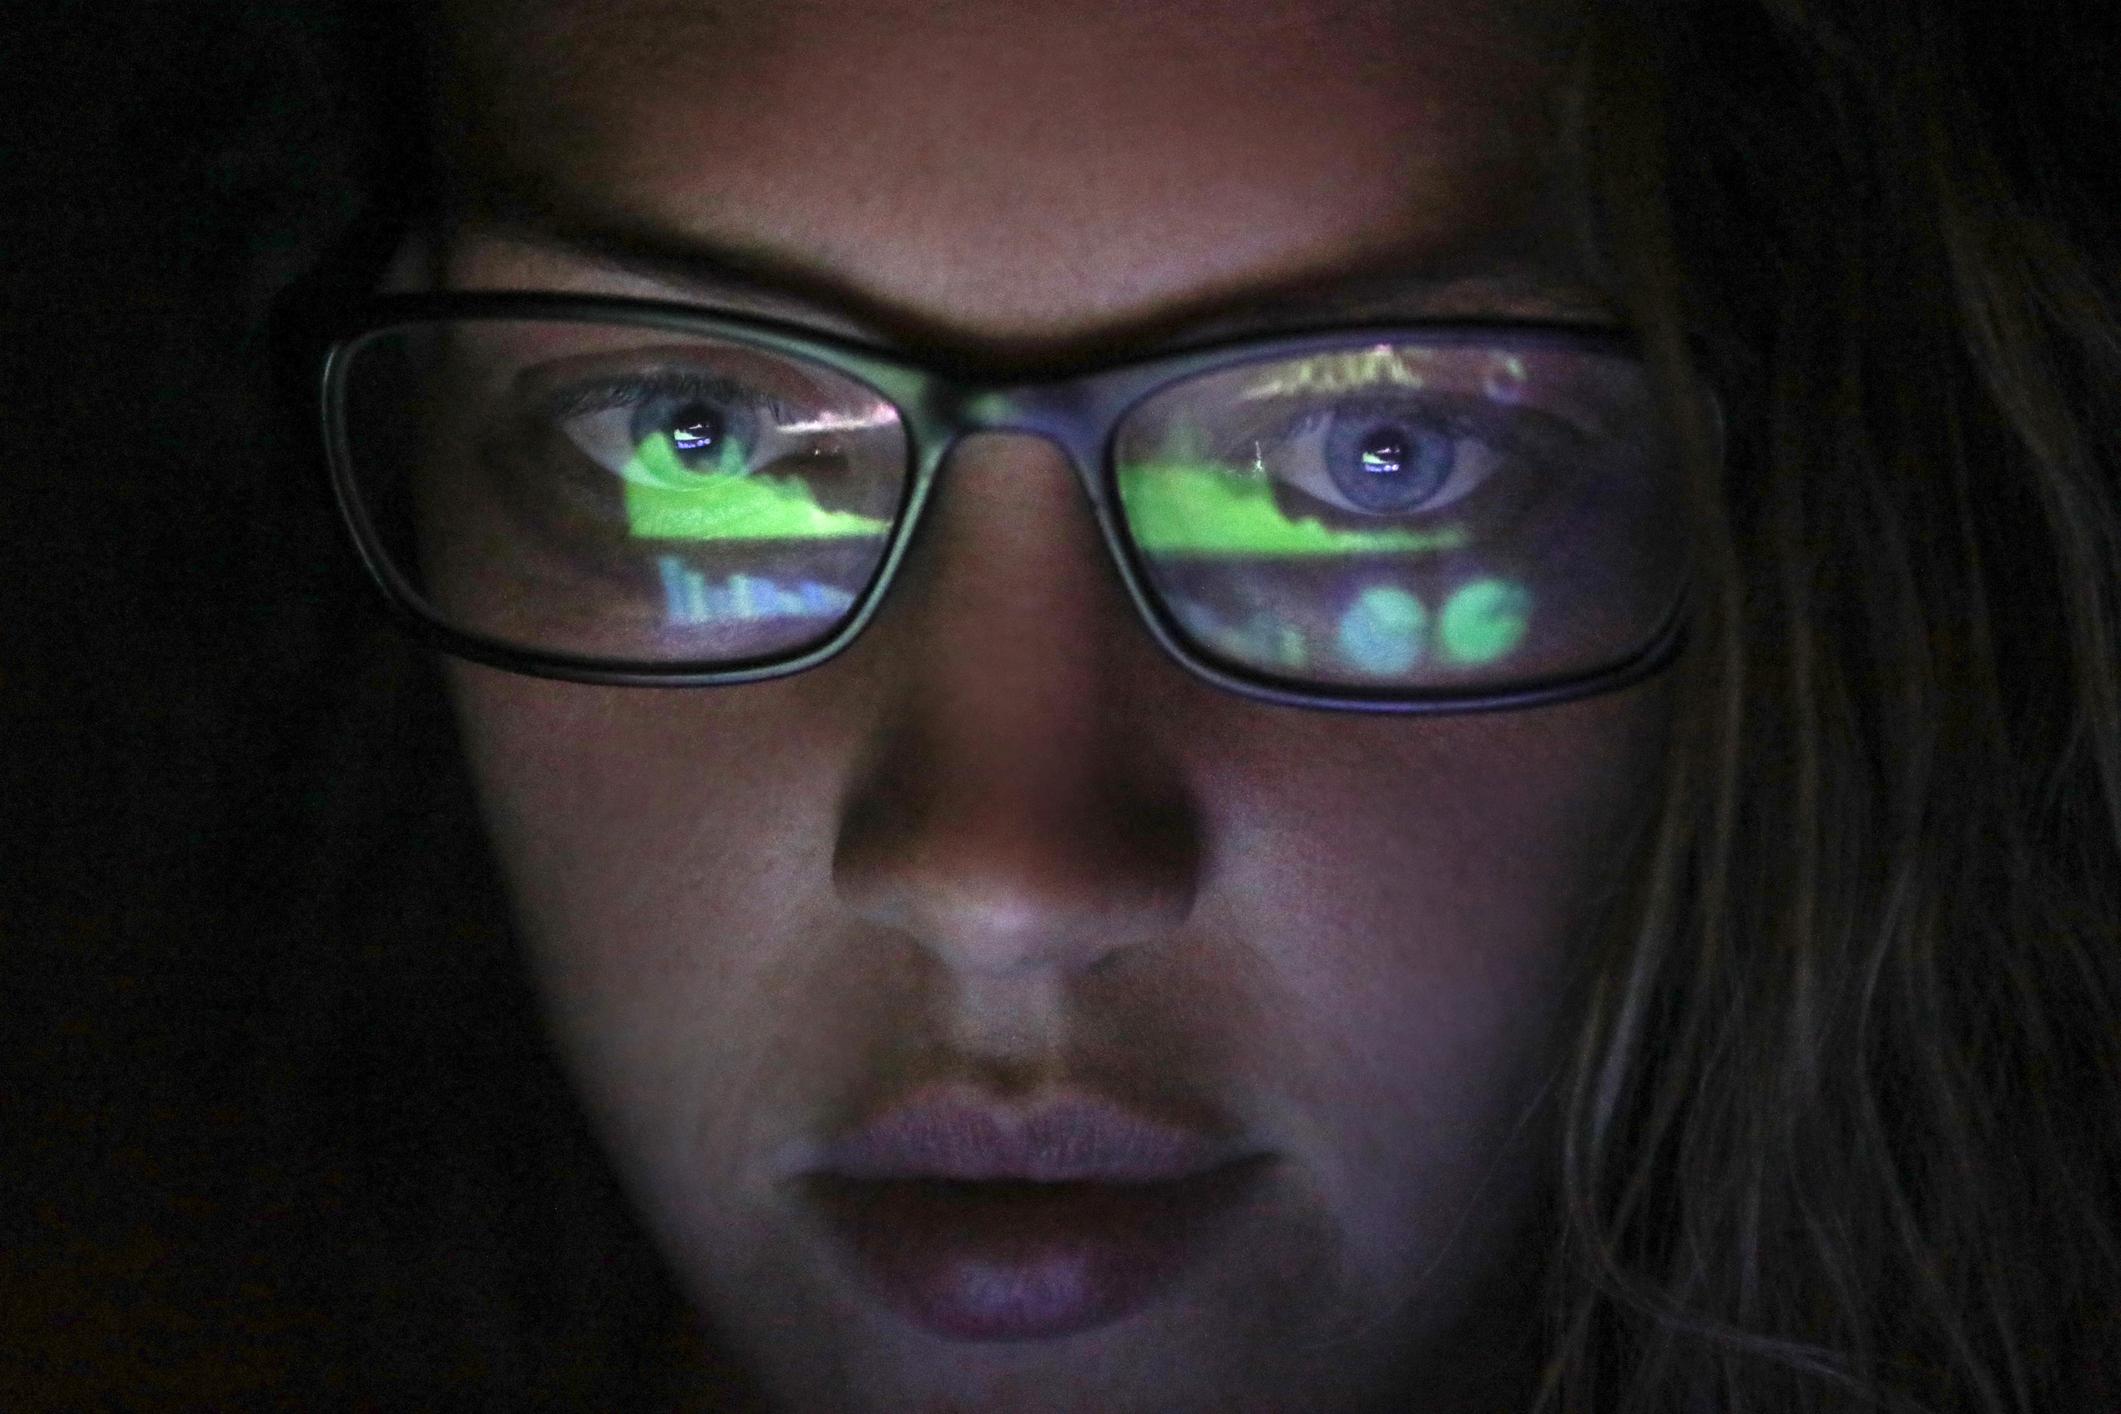 female looking at screen in dark